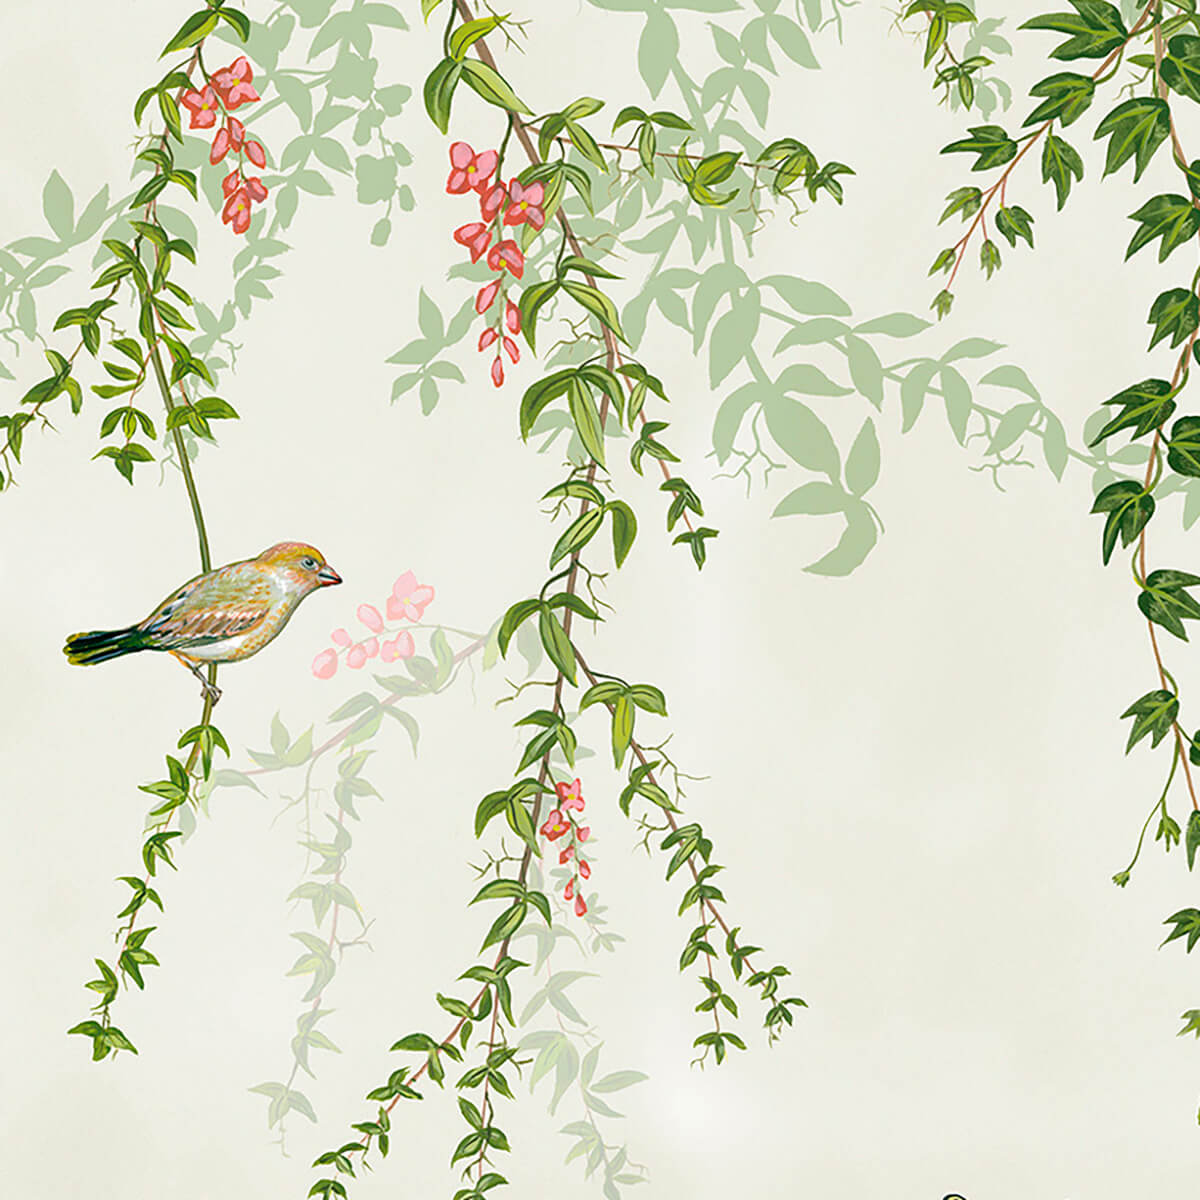 Painel jardim suspenso | Snijder & Co